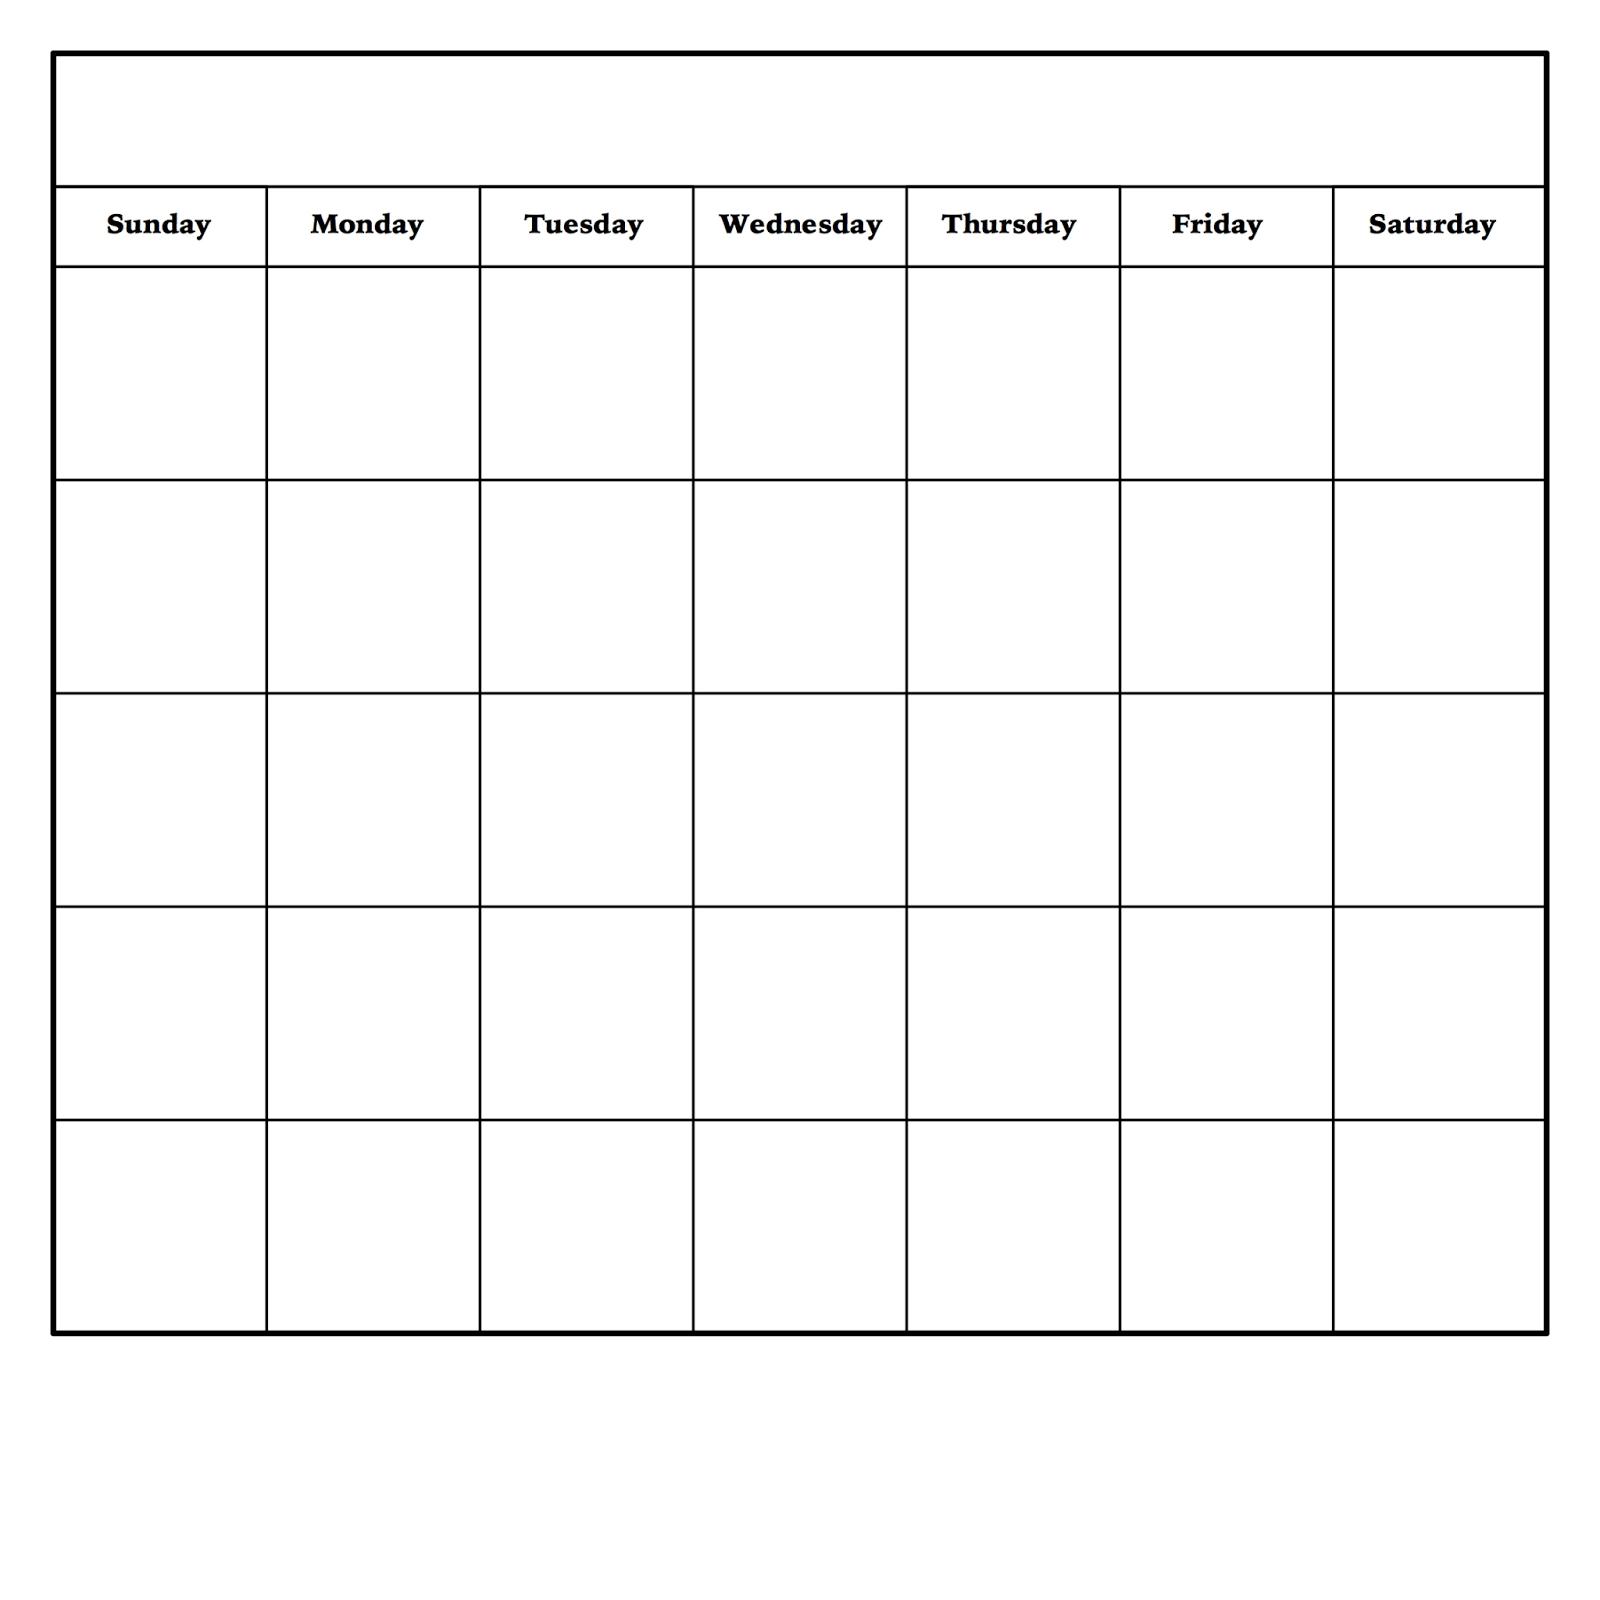 Blank Monday Through Friday Pdf | Calendar Template Printable inside Free Monday Through Friday Calendar Template